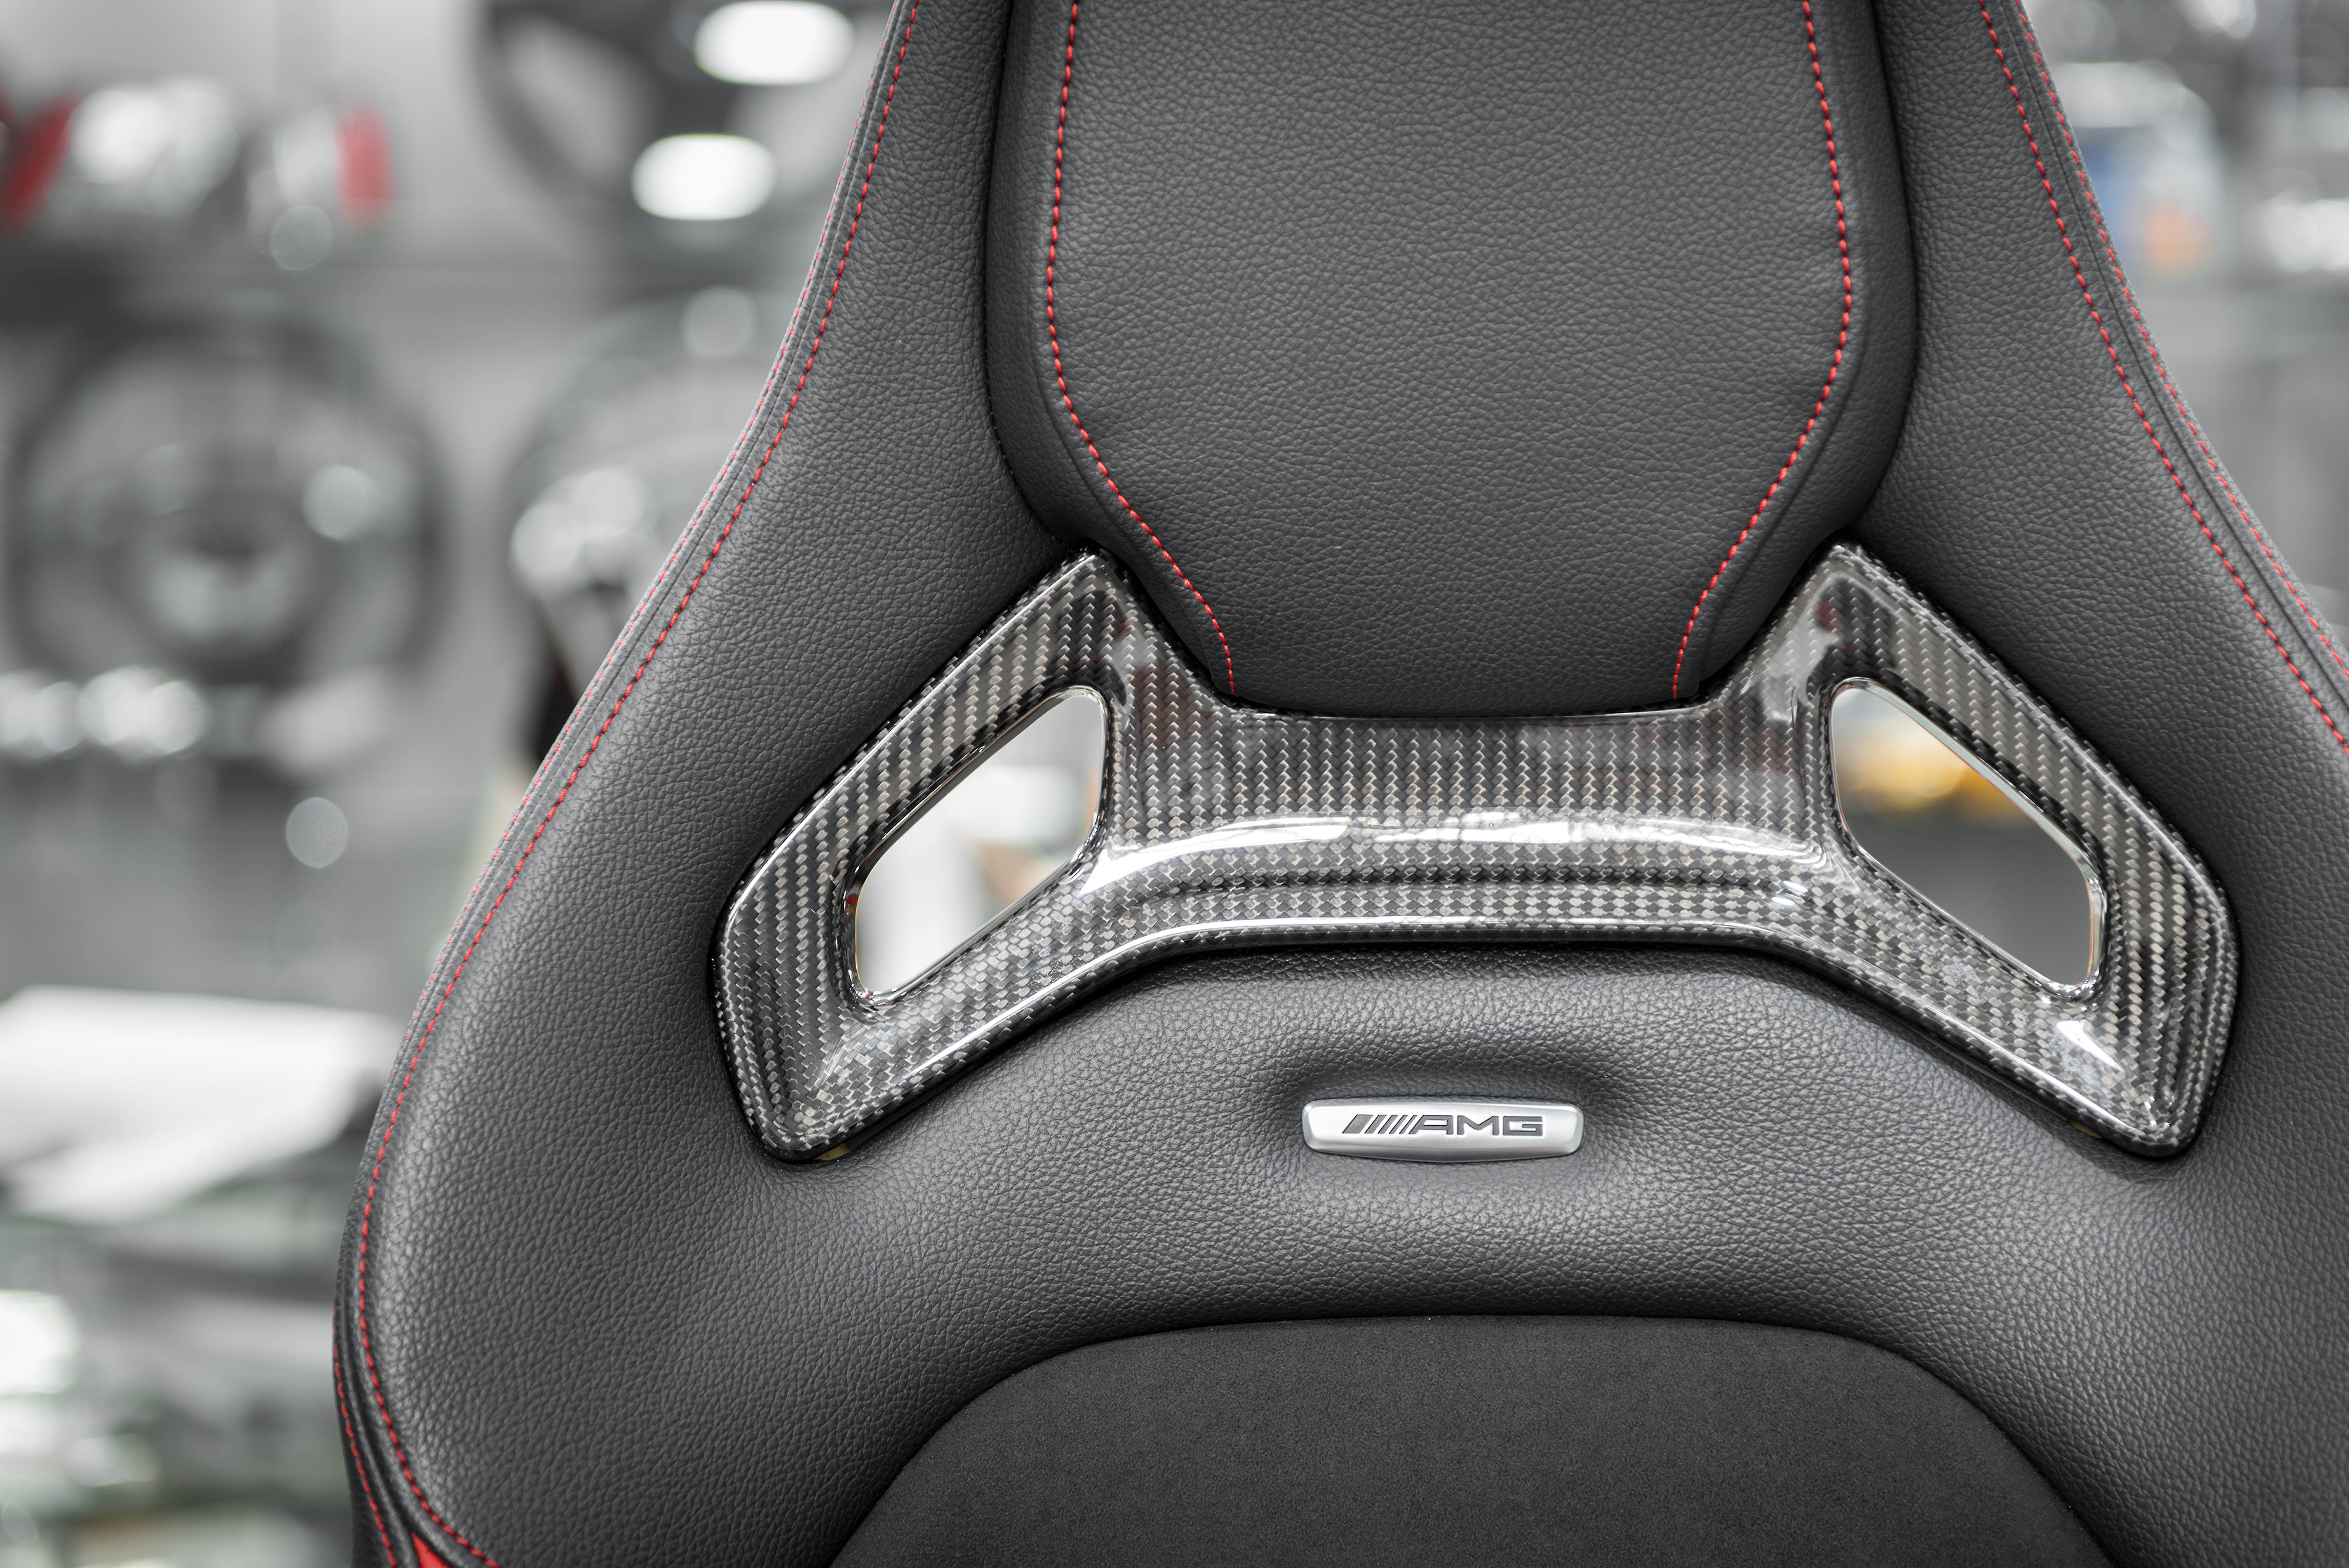 gla 45 amg carbon fiber interior